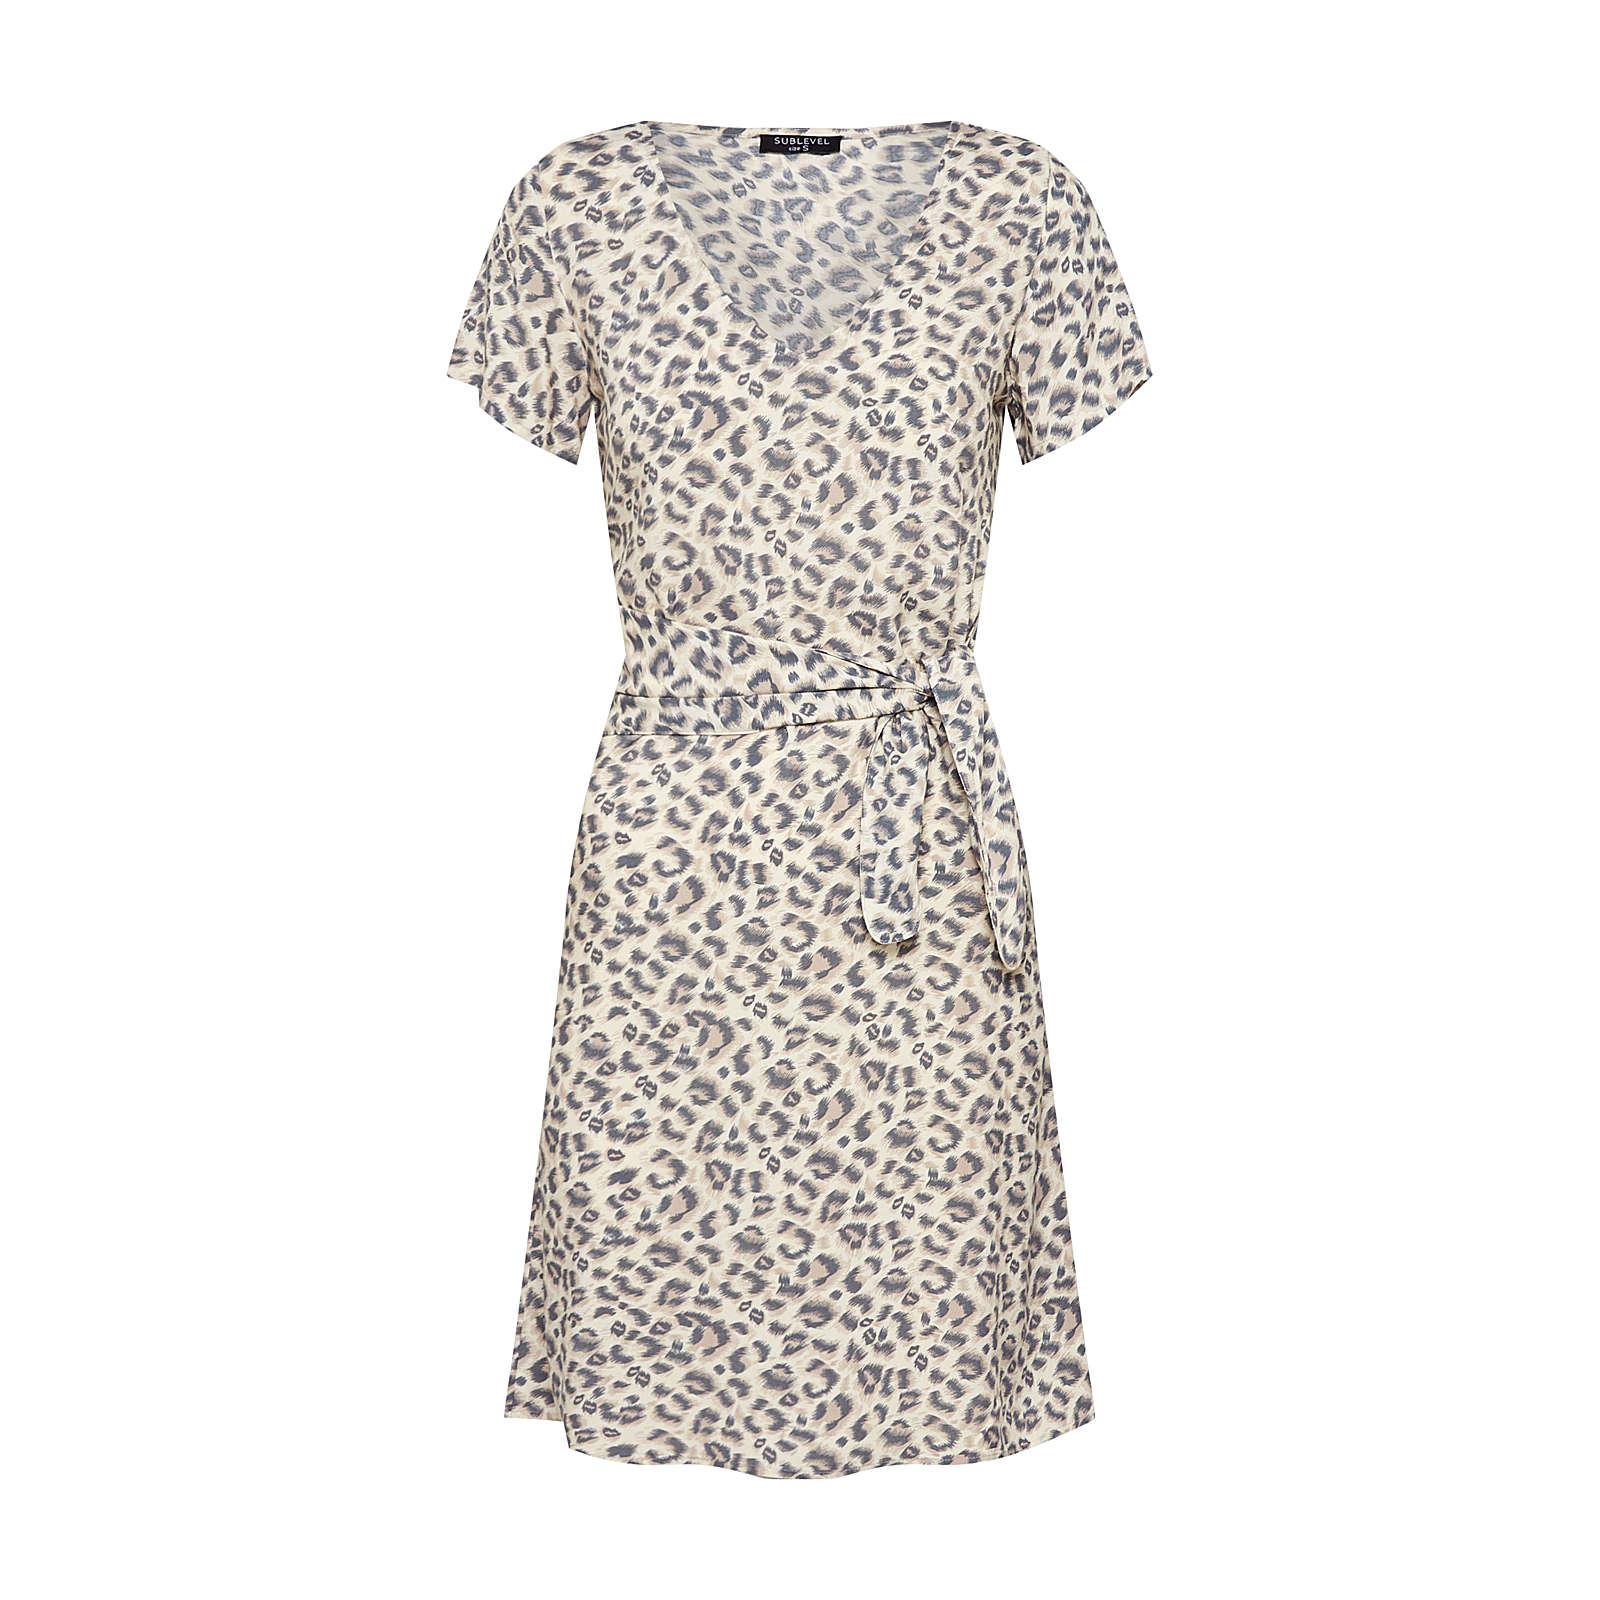 Sublevel Sommerkleid Sommerkleider beige Damen Gr. 40